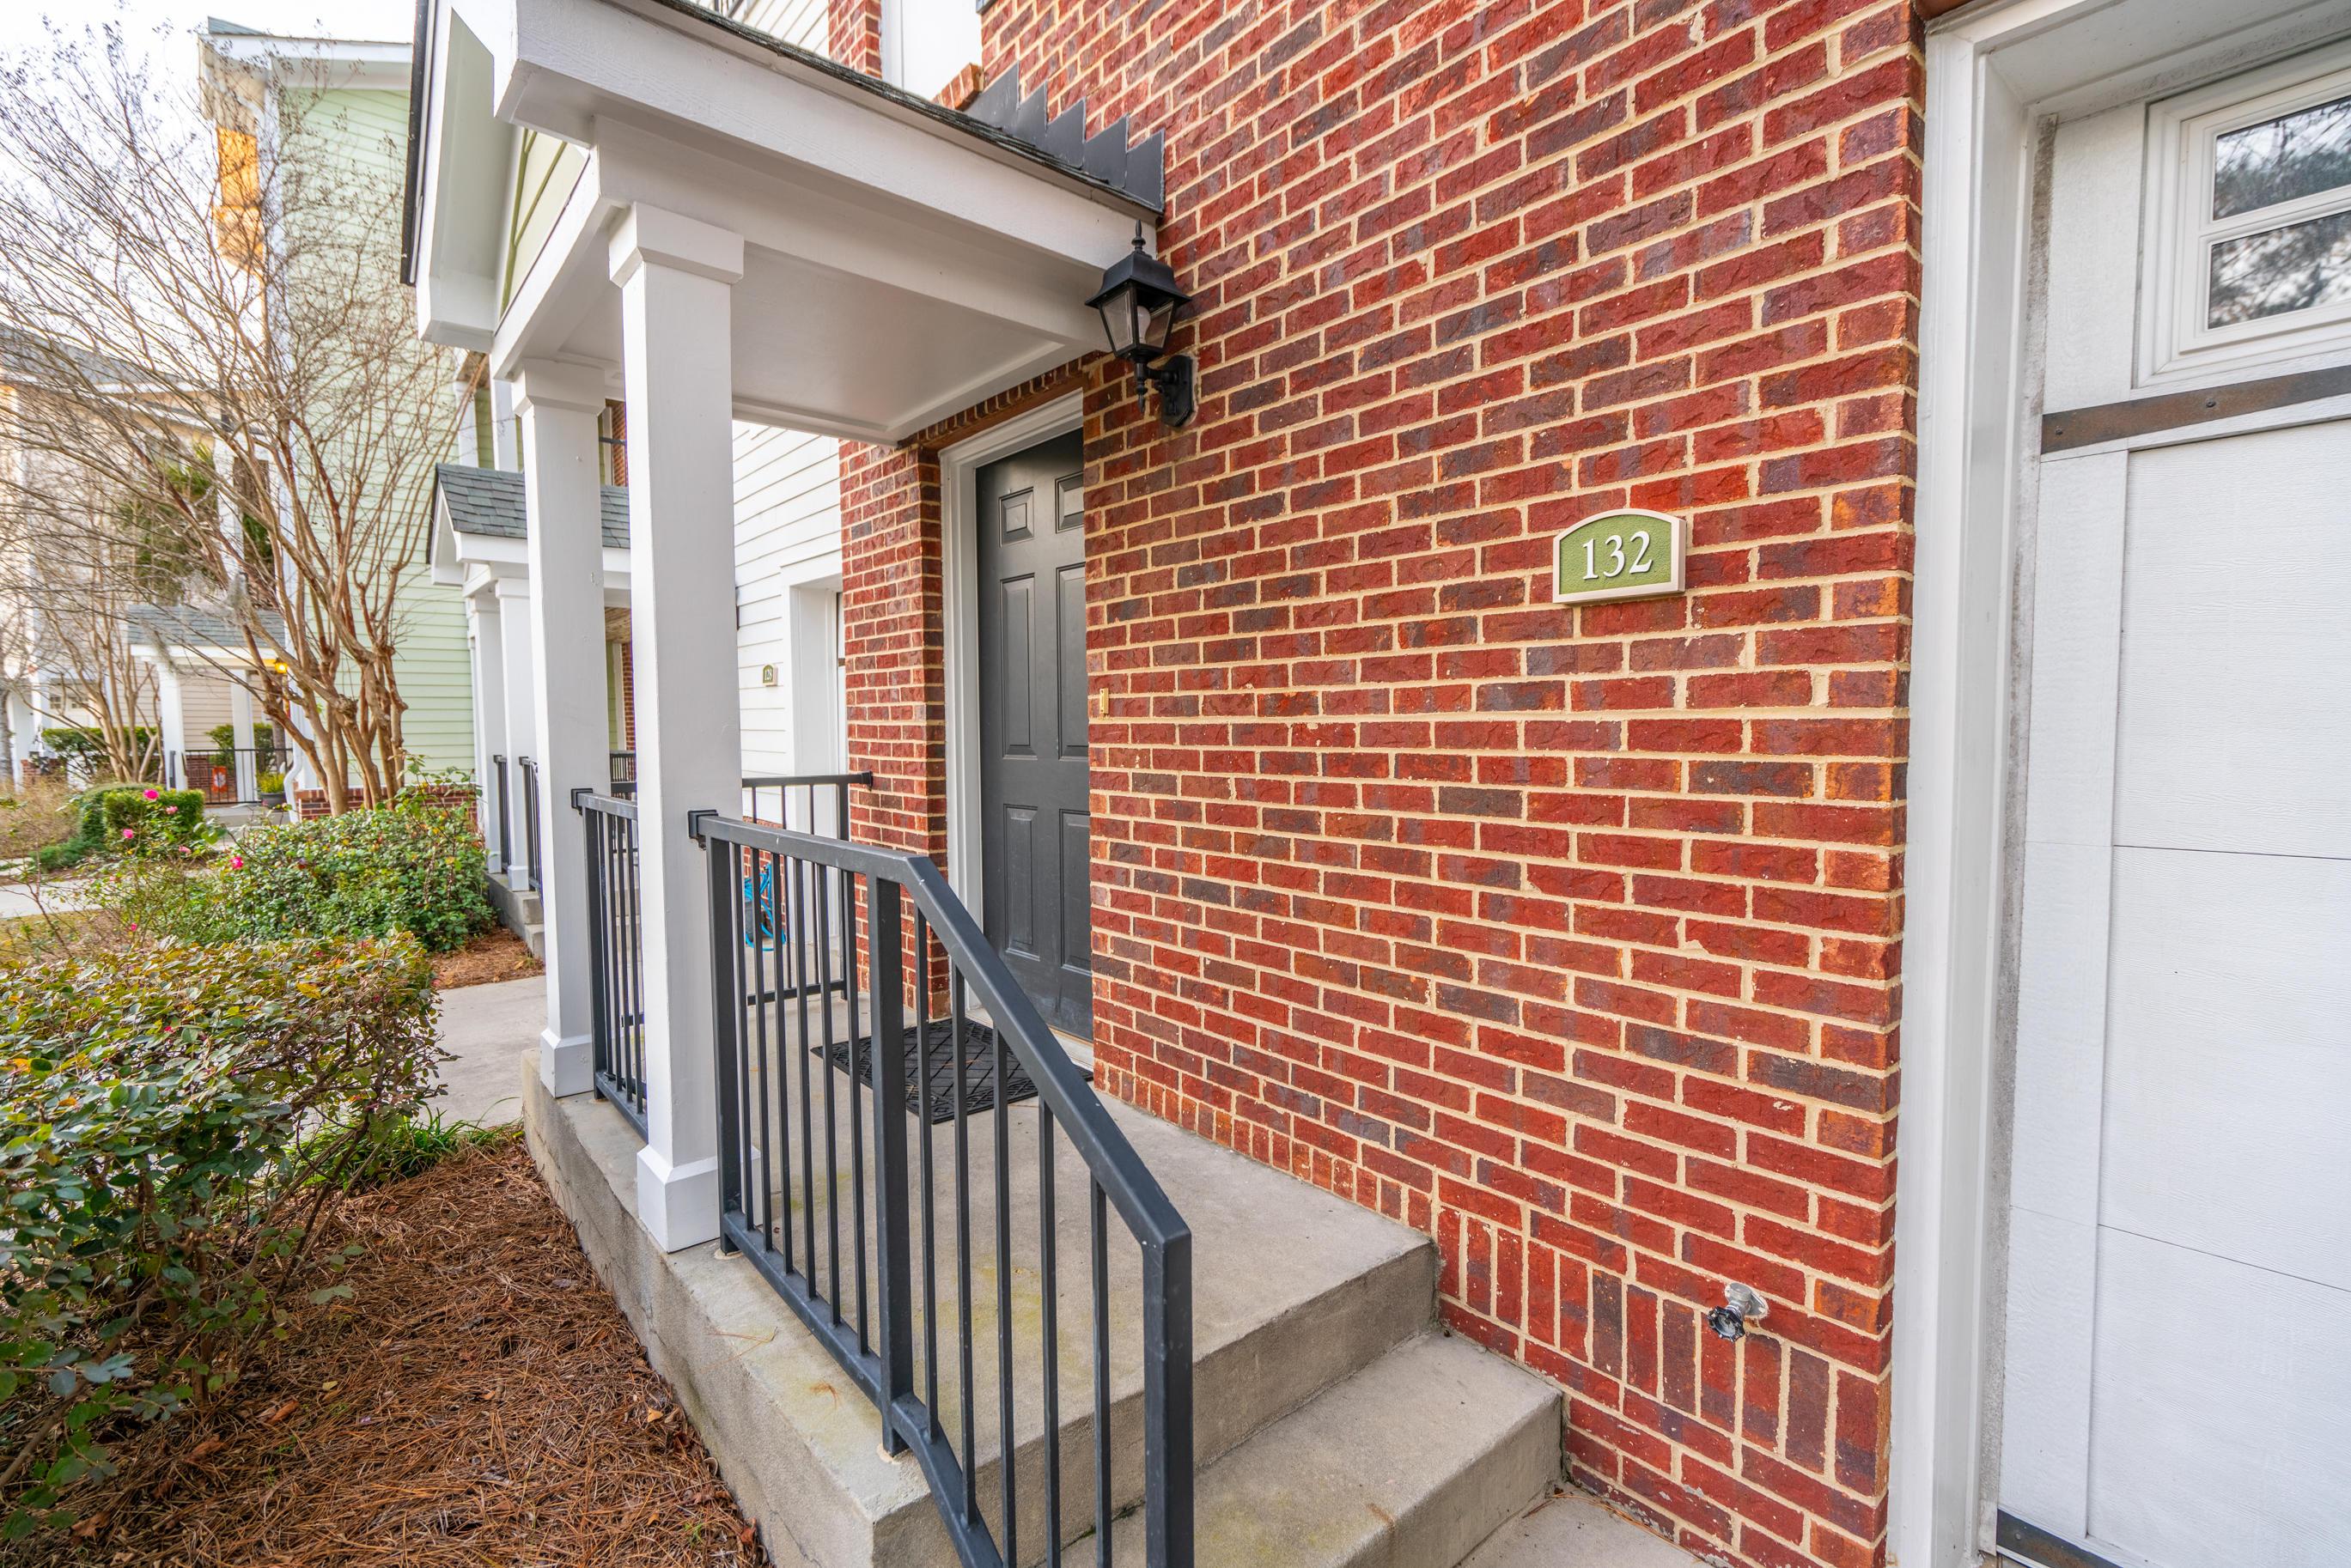 Etiwan Pointe Homes For Sale - 132 Winding Creek, Mount Pleasant, SC - 31